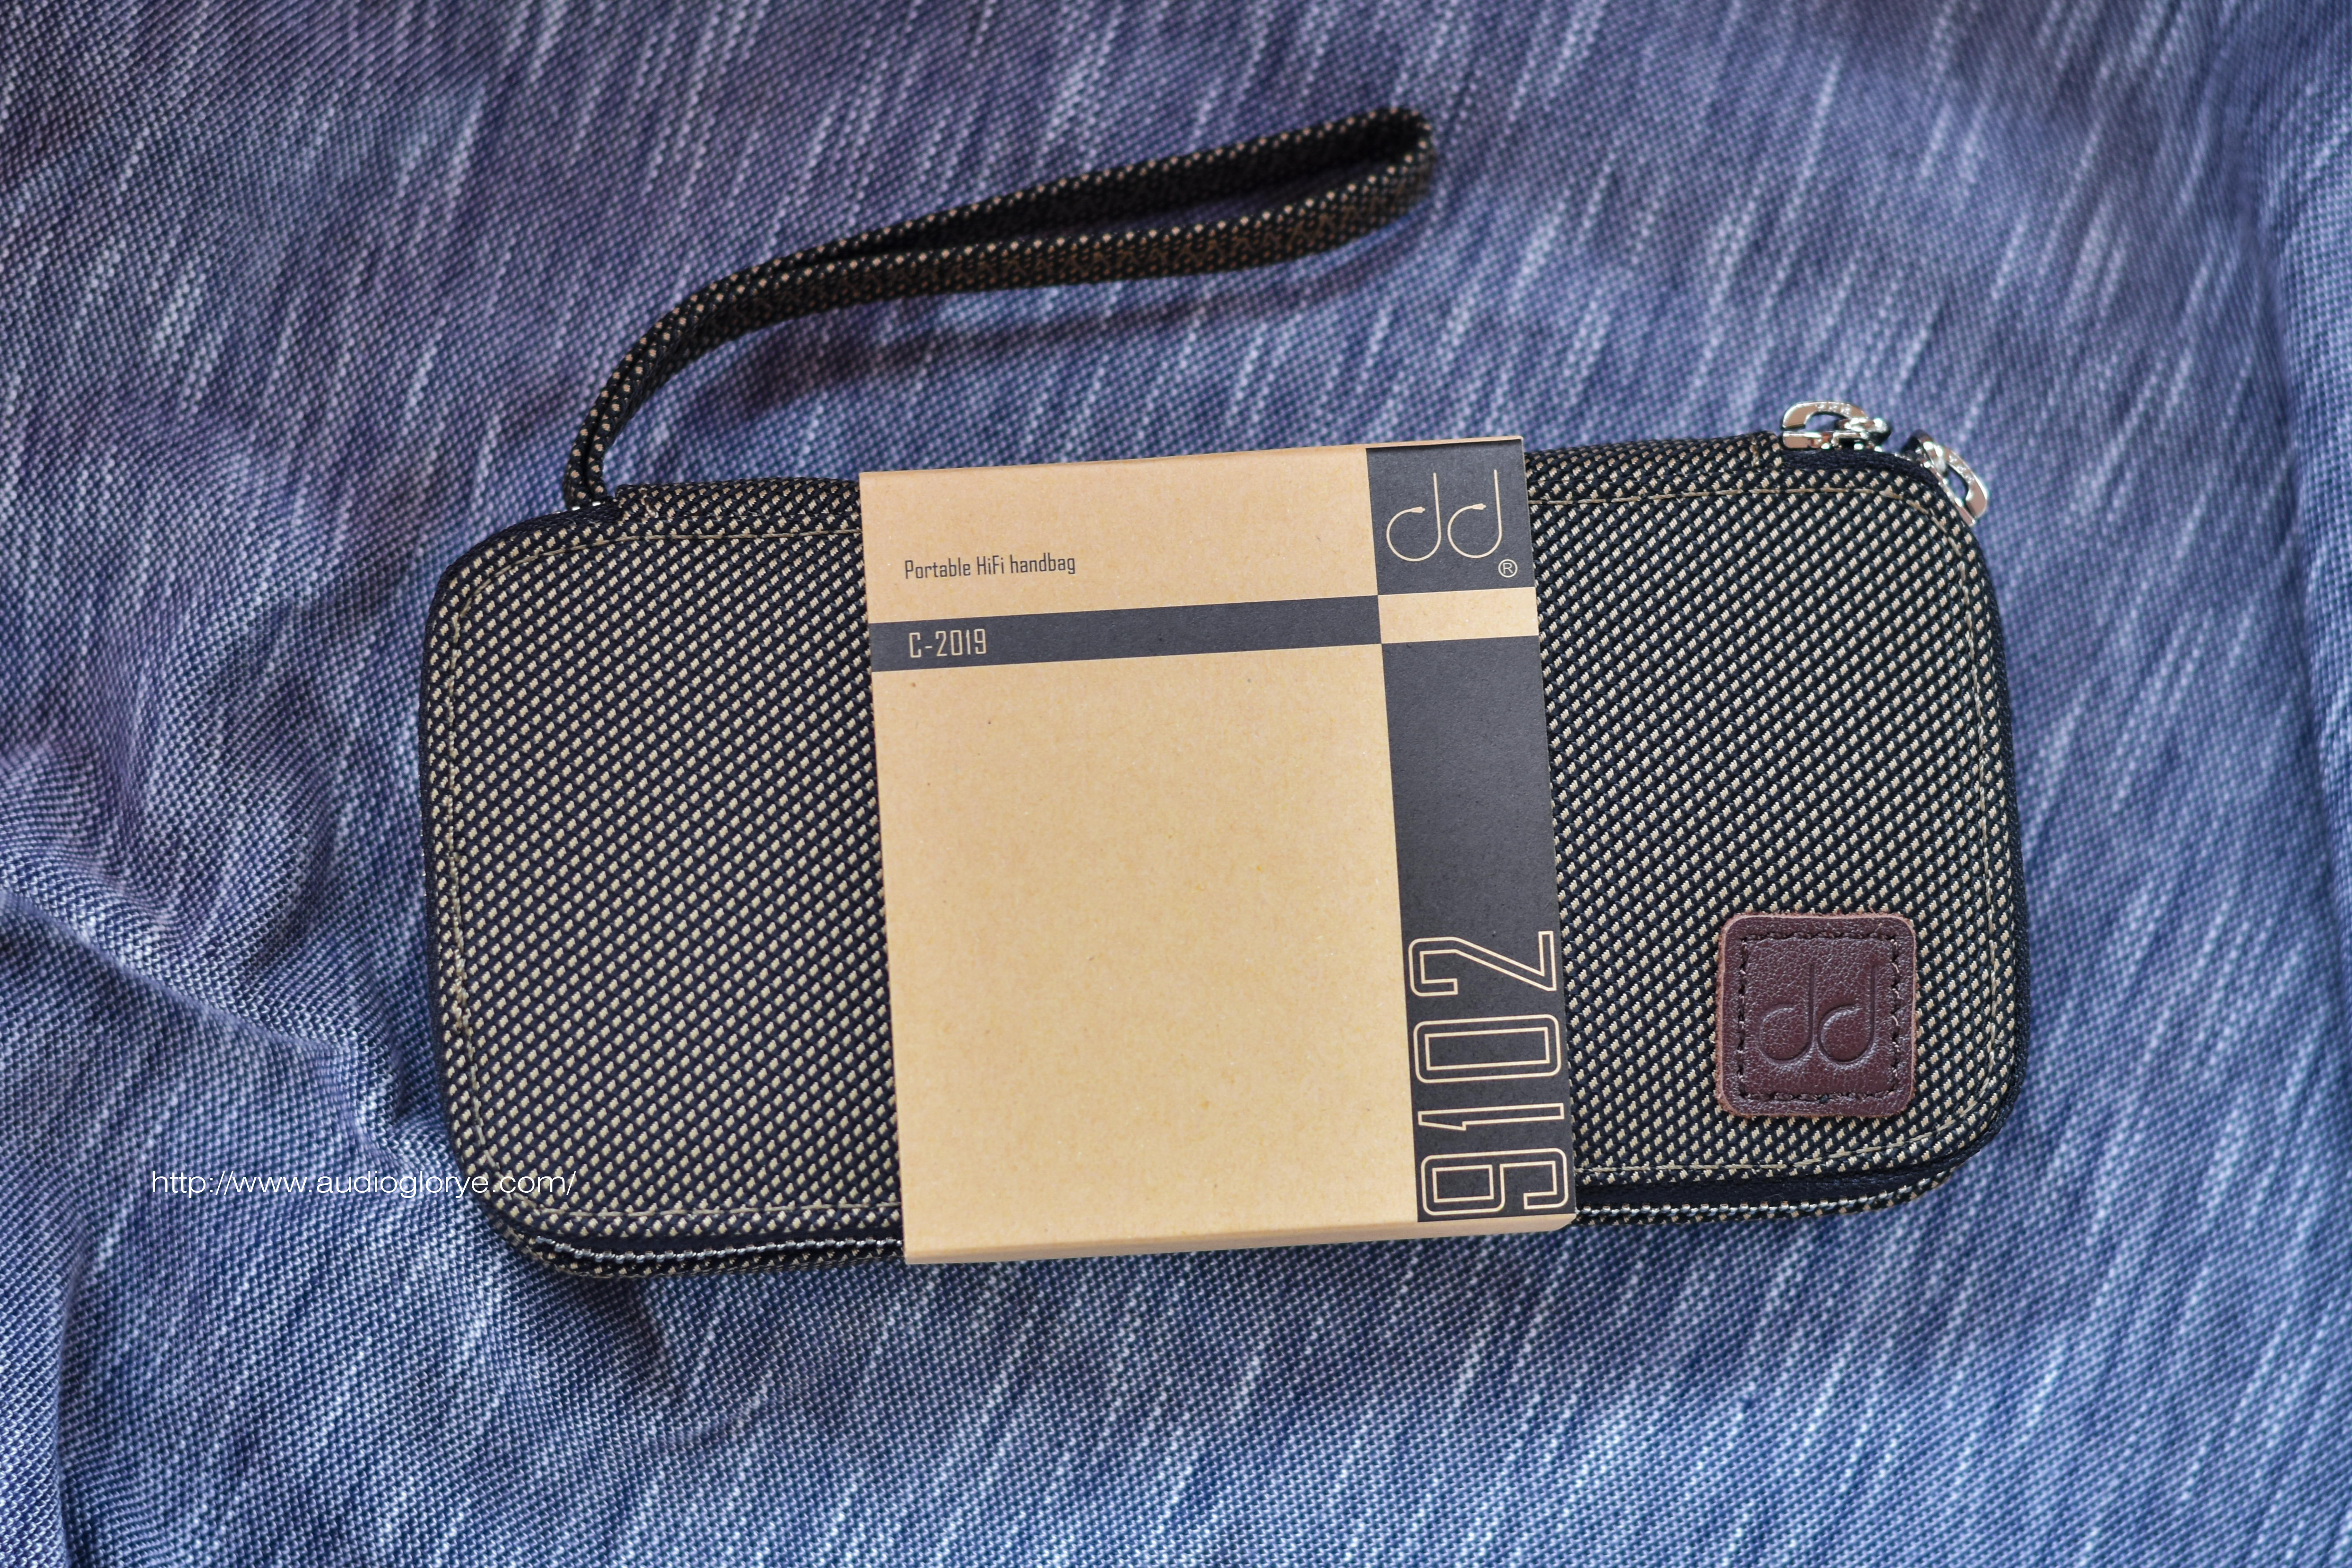 DD C-2019 Hi-Fi Carrying Case